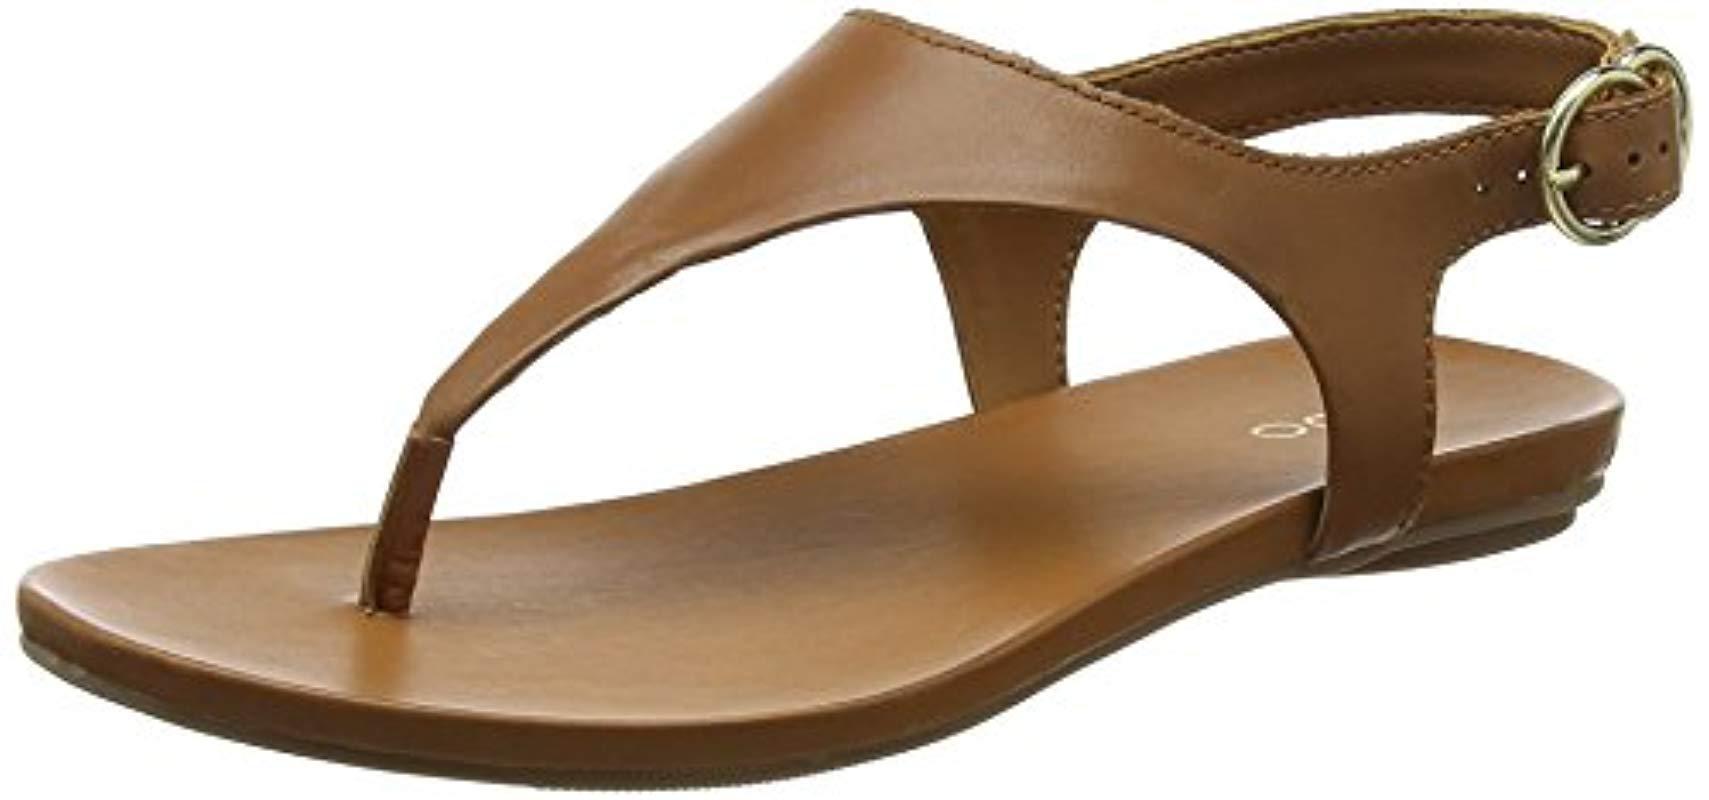 6773fd1340aa Aldo  s Jerilassi Ankle Strap Sandals in Brown - Lyst